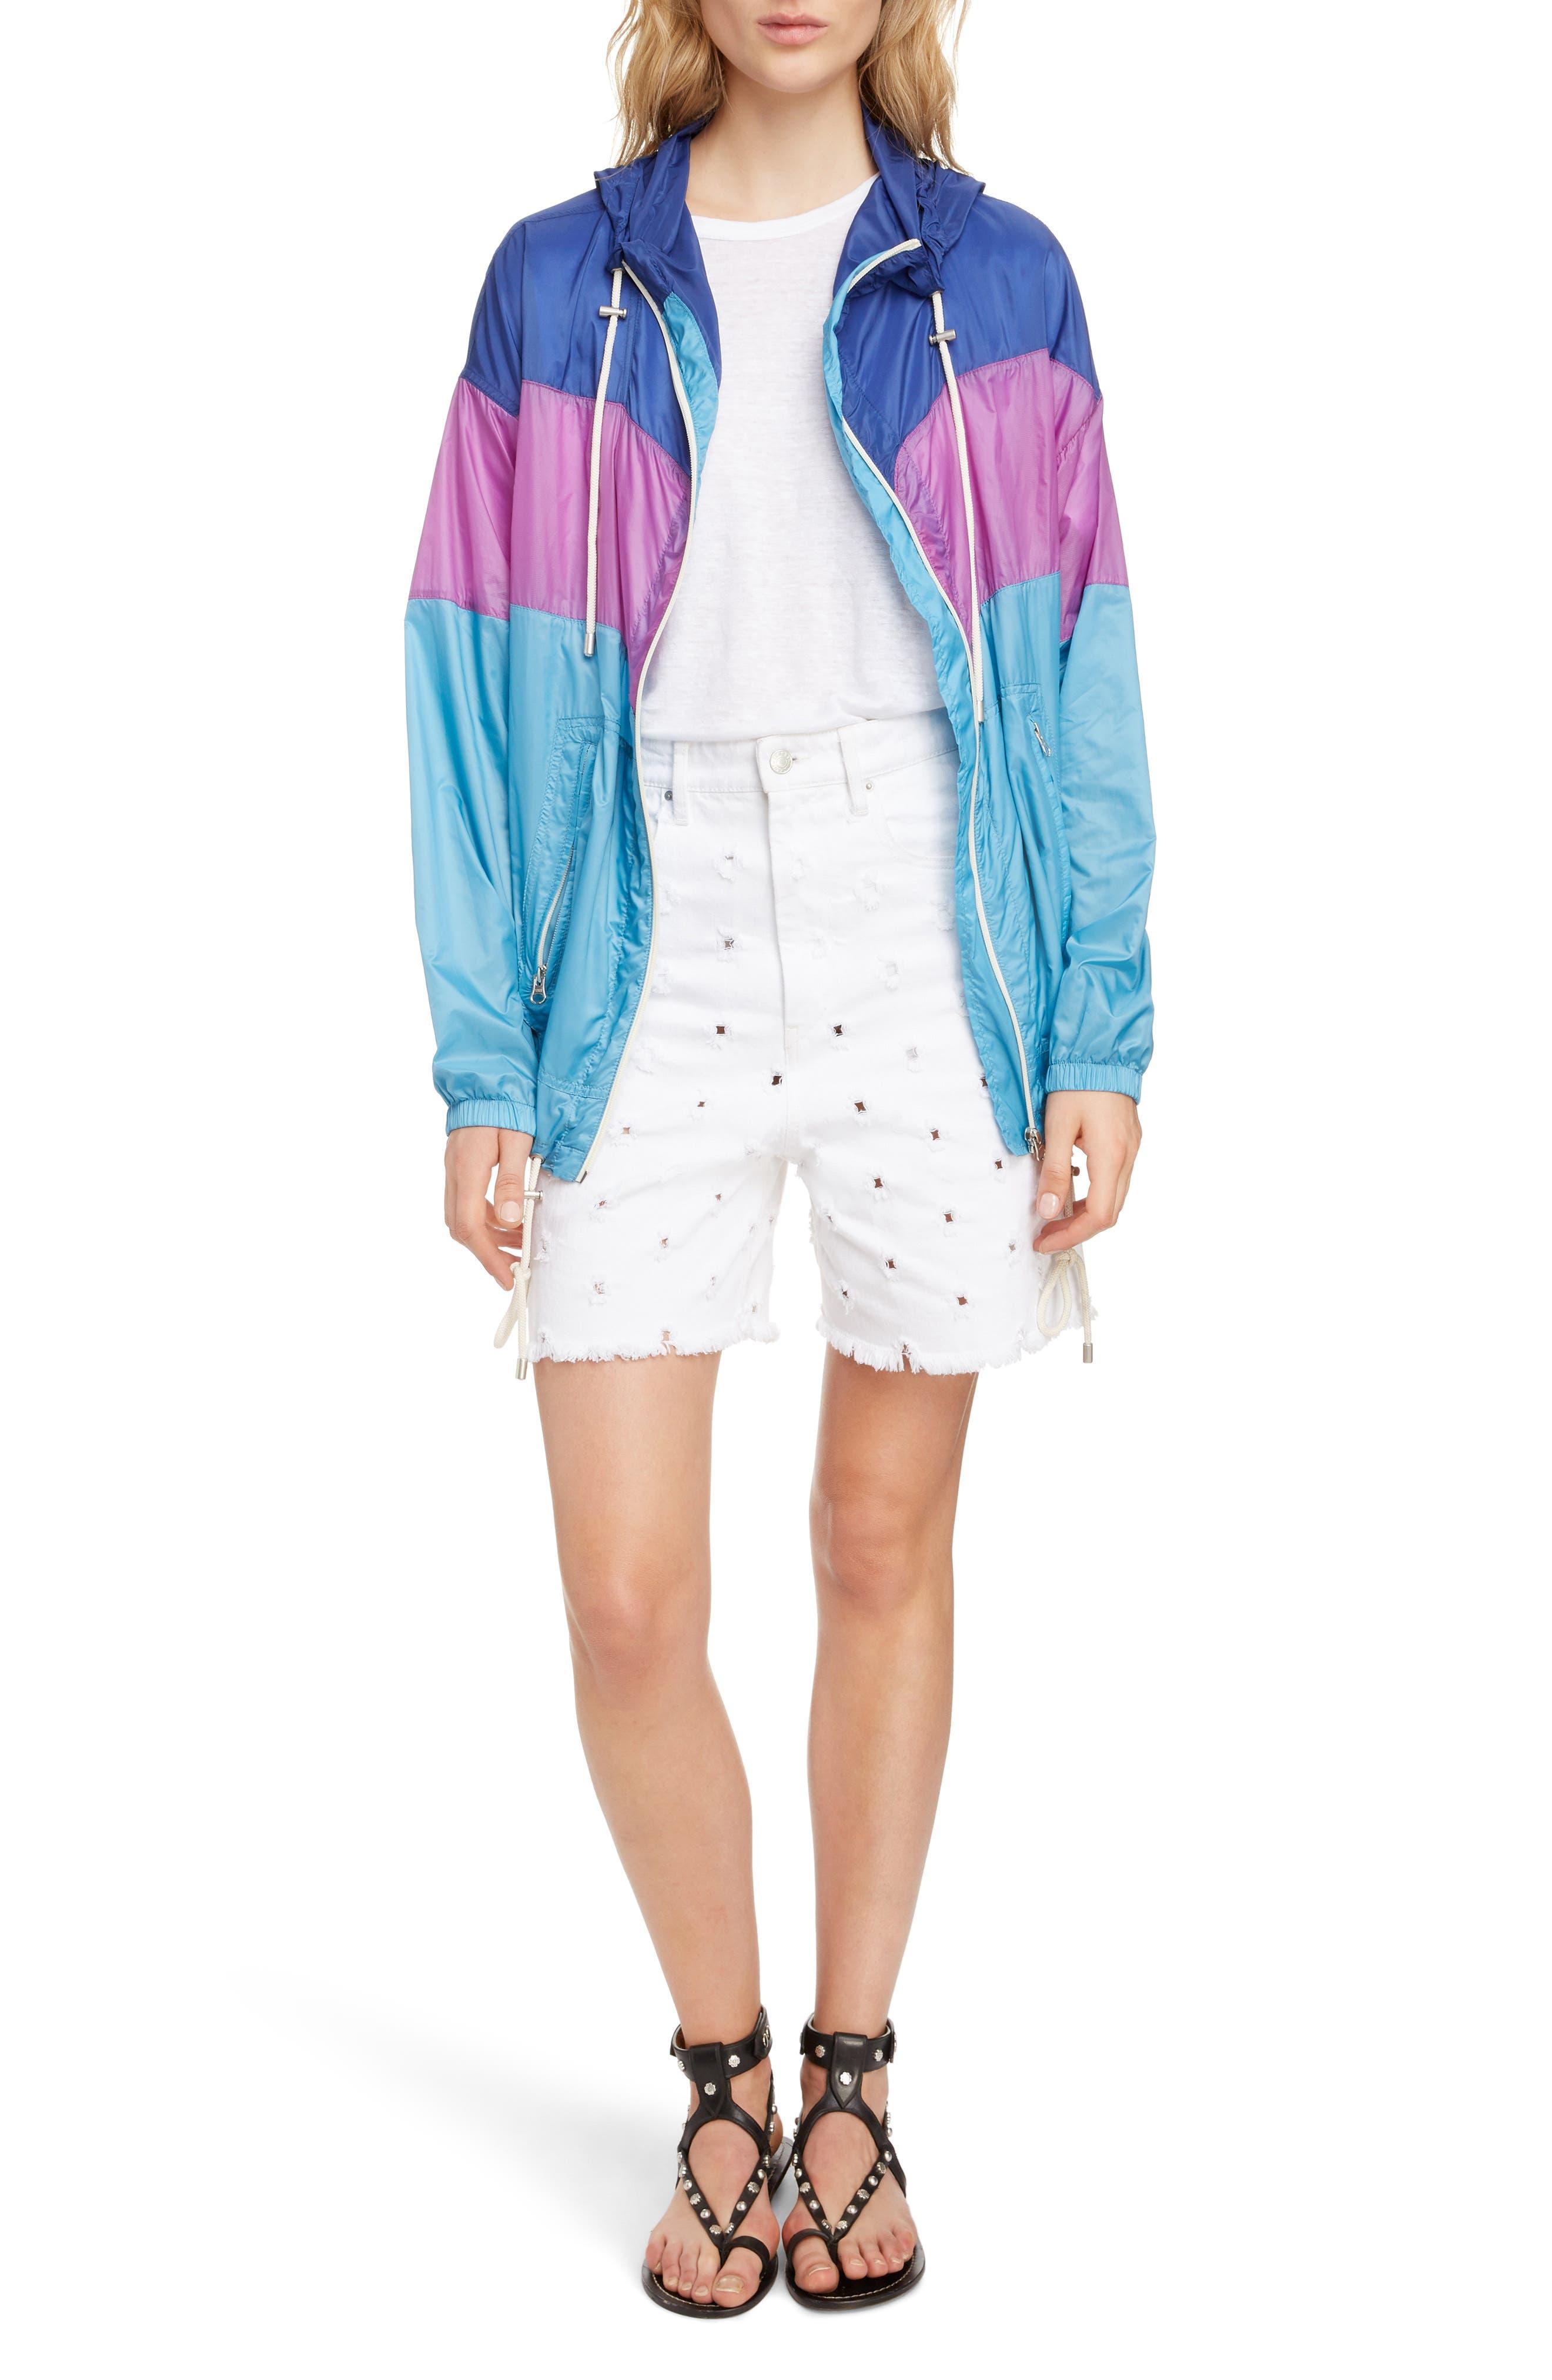 ISABEL MARANT ÉTOILE, Kyriel Colorblock Hooded Jacket, Alternate thumbnail 8, color, ELECTRIC BLUE/ VIOLET